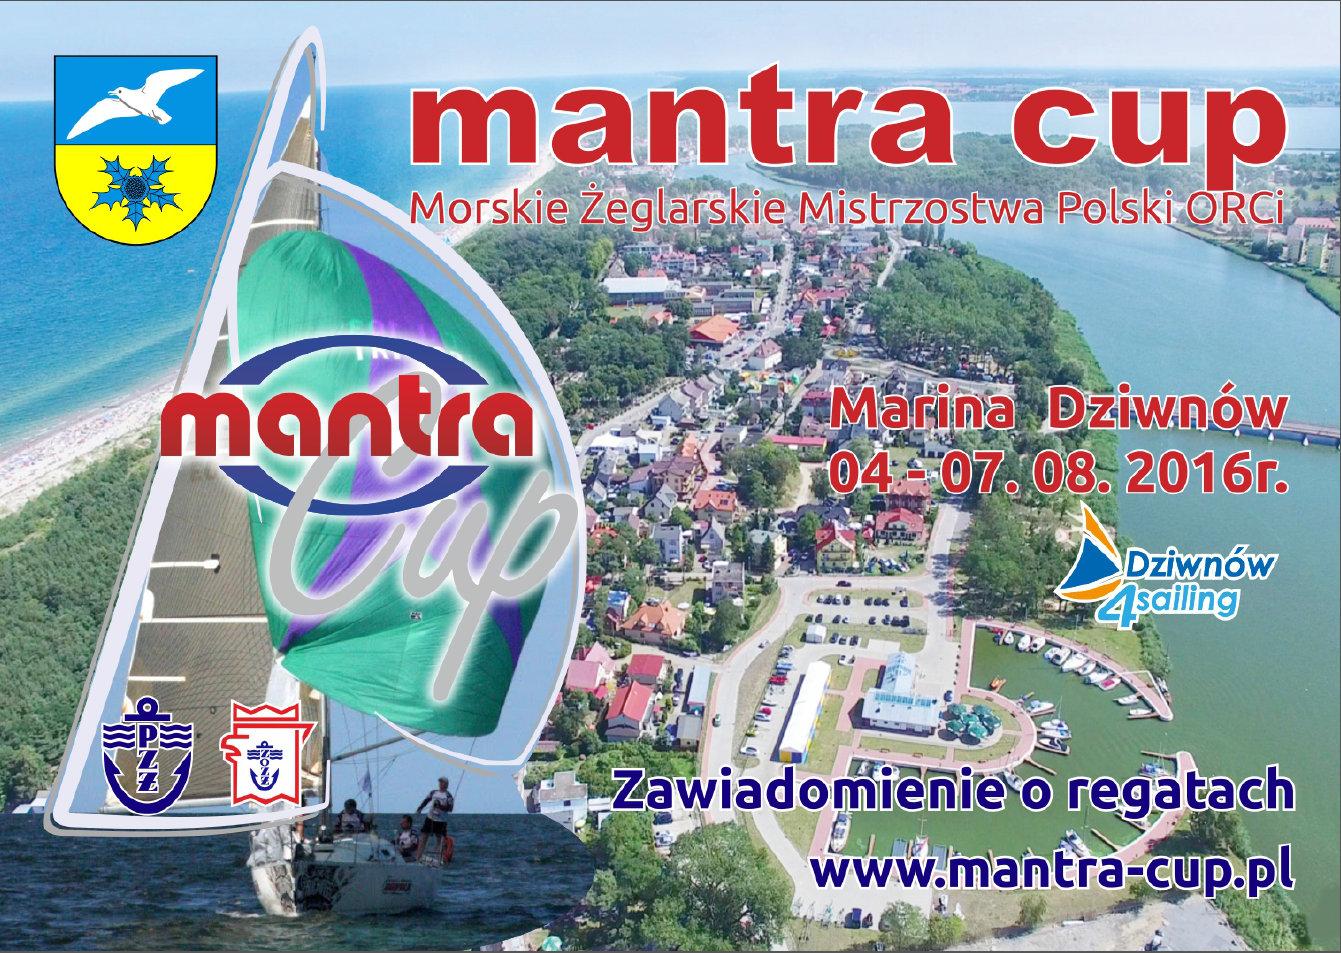 Mantra Cup